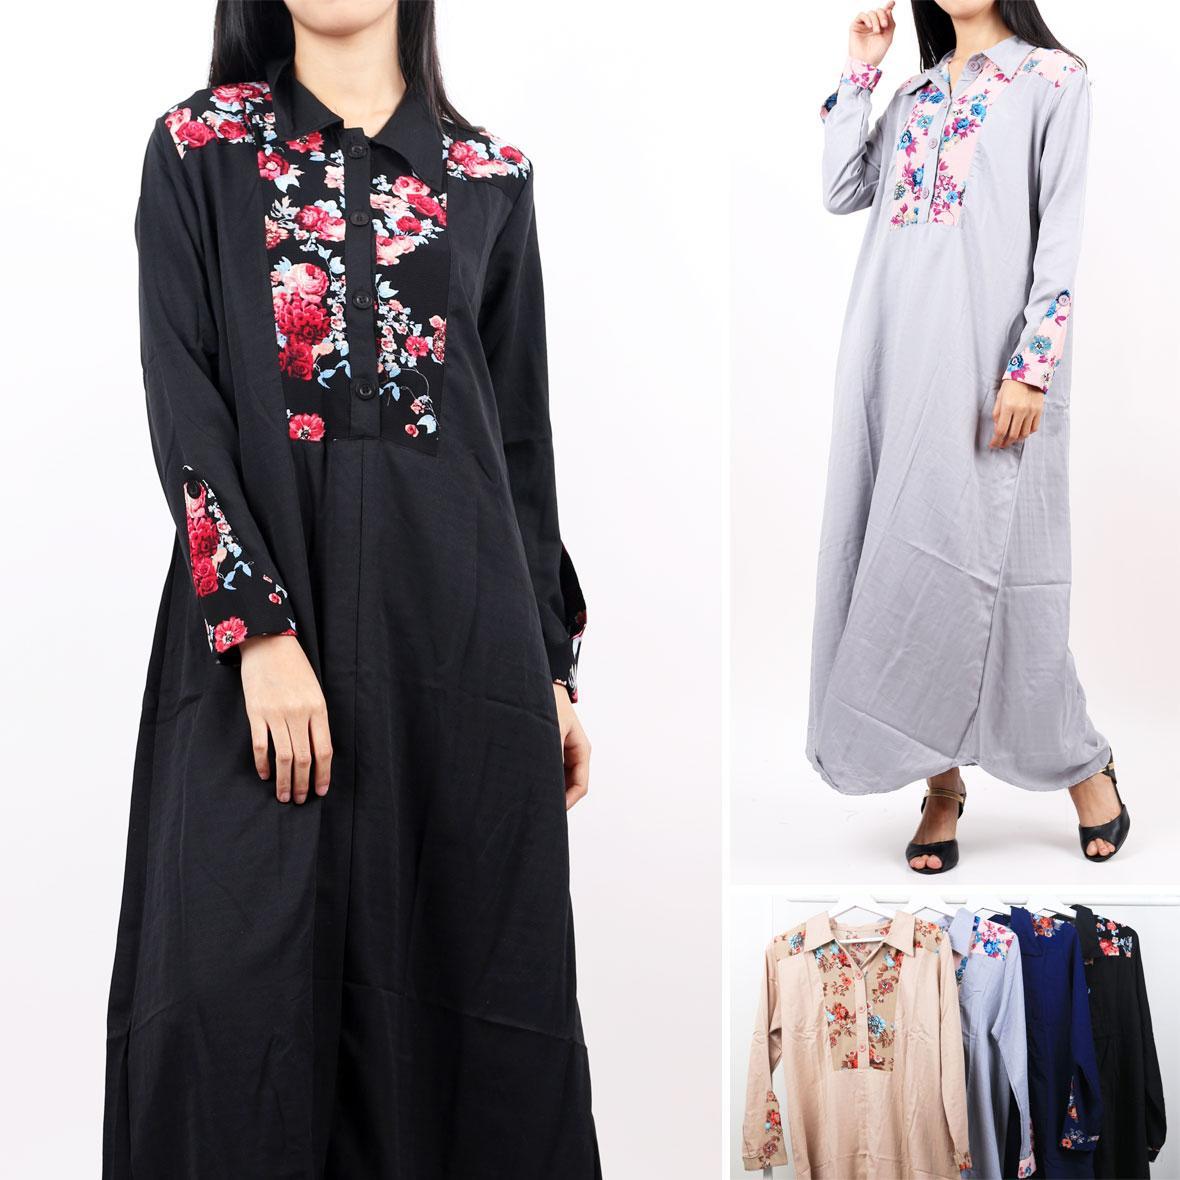 Oma Holley Fashion Naria Dress MaxiIDR70000. Rp 78.000